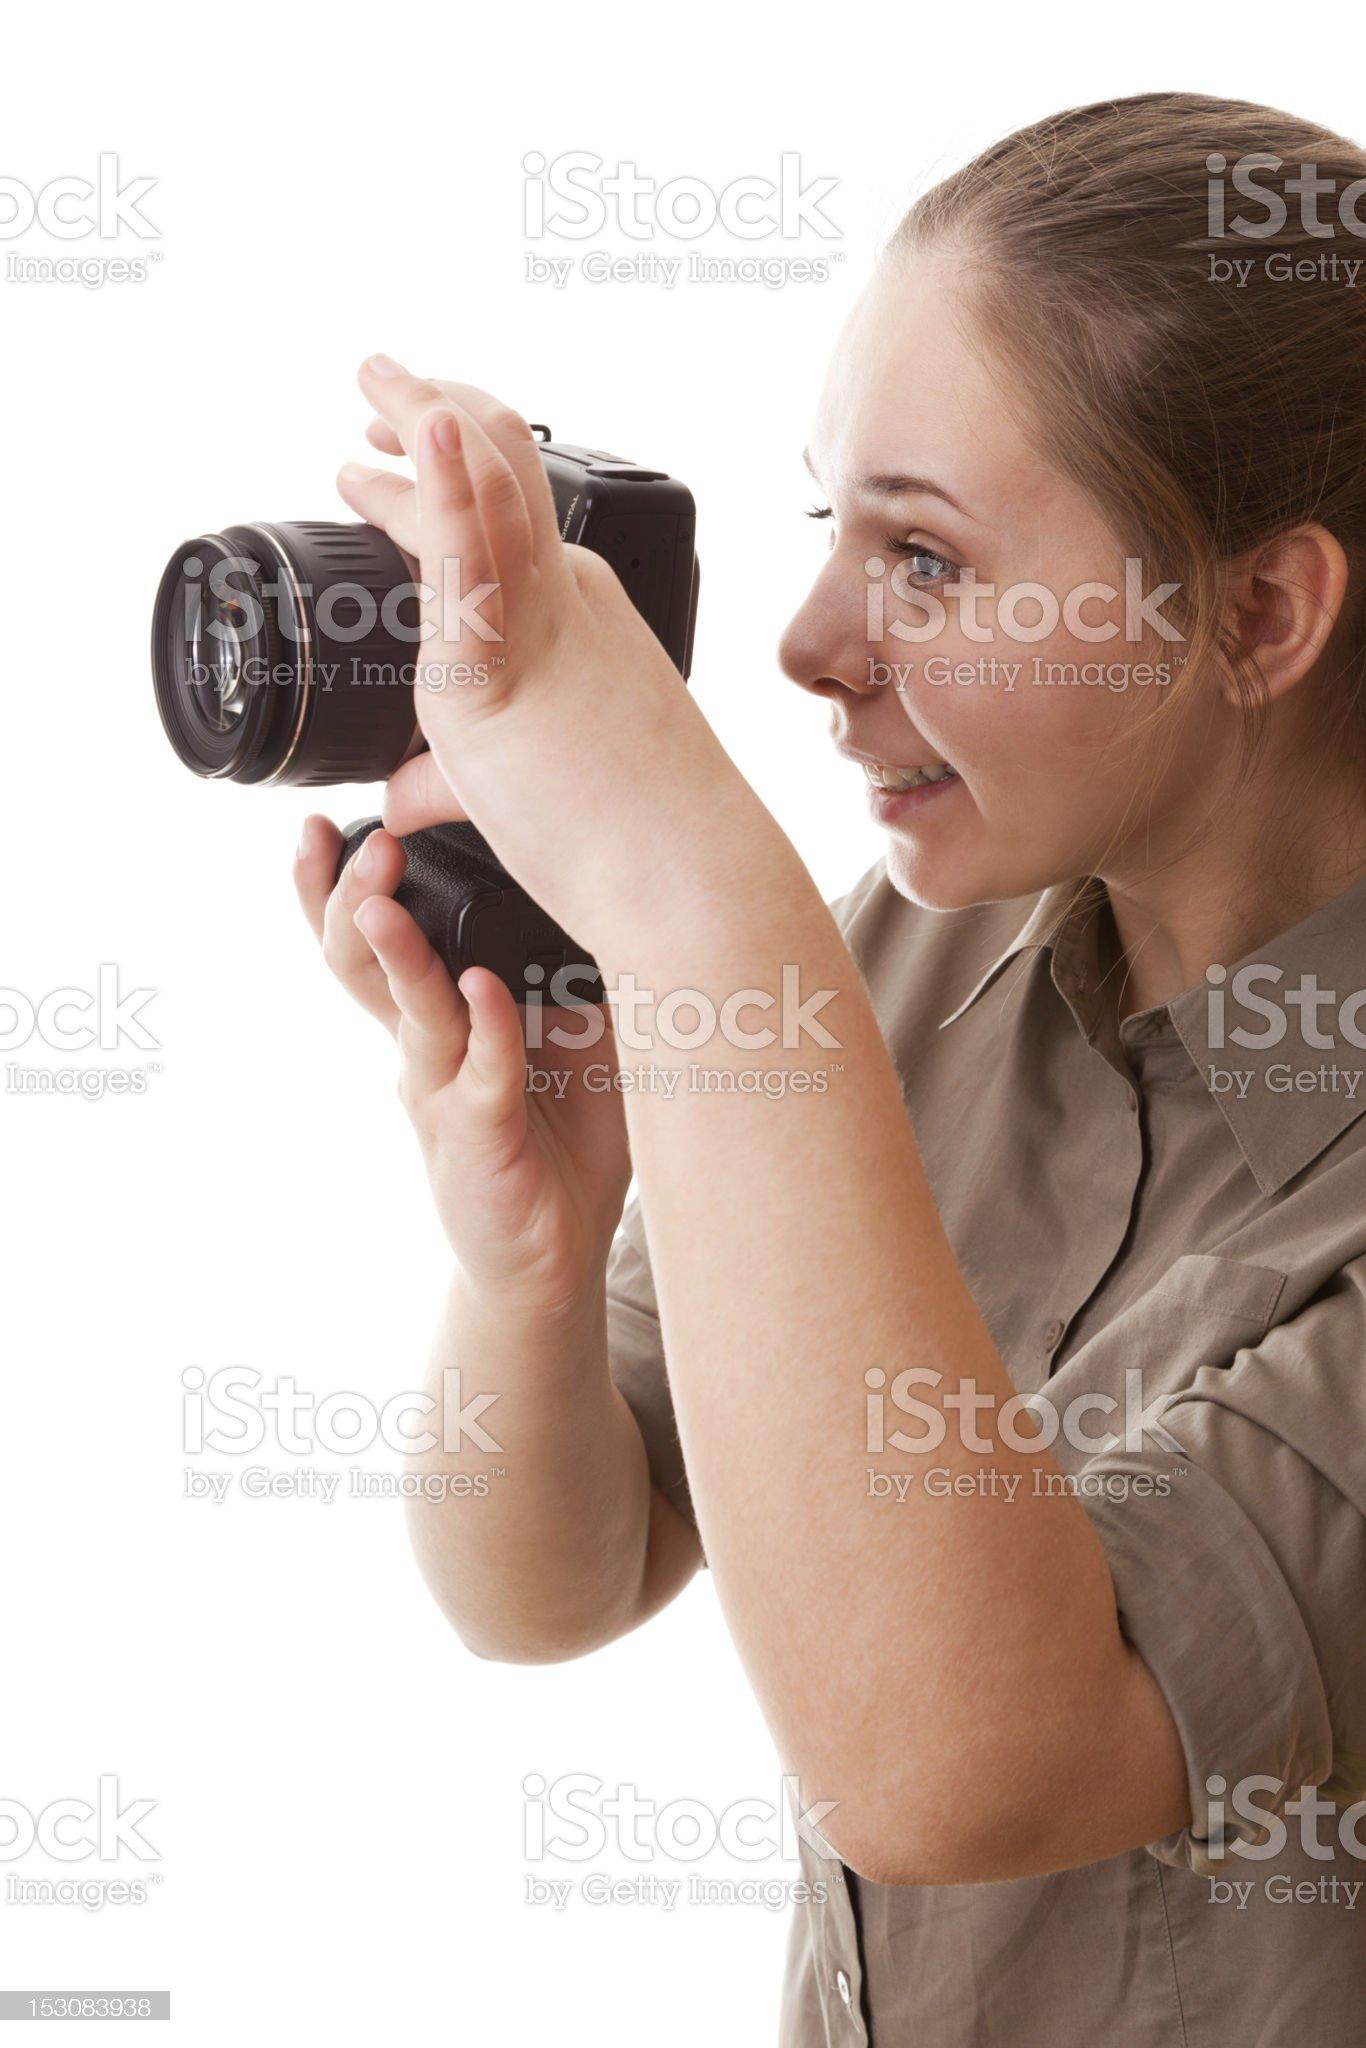 Real teenager girl, Photographer royalty-free stock photo